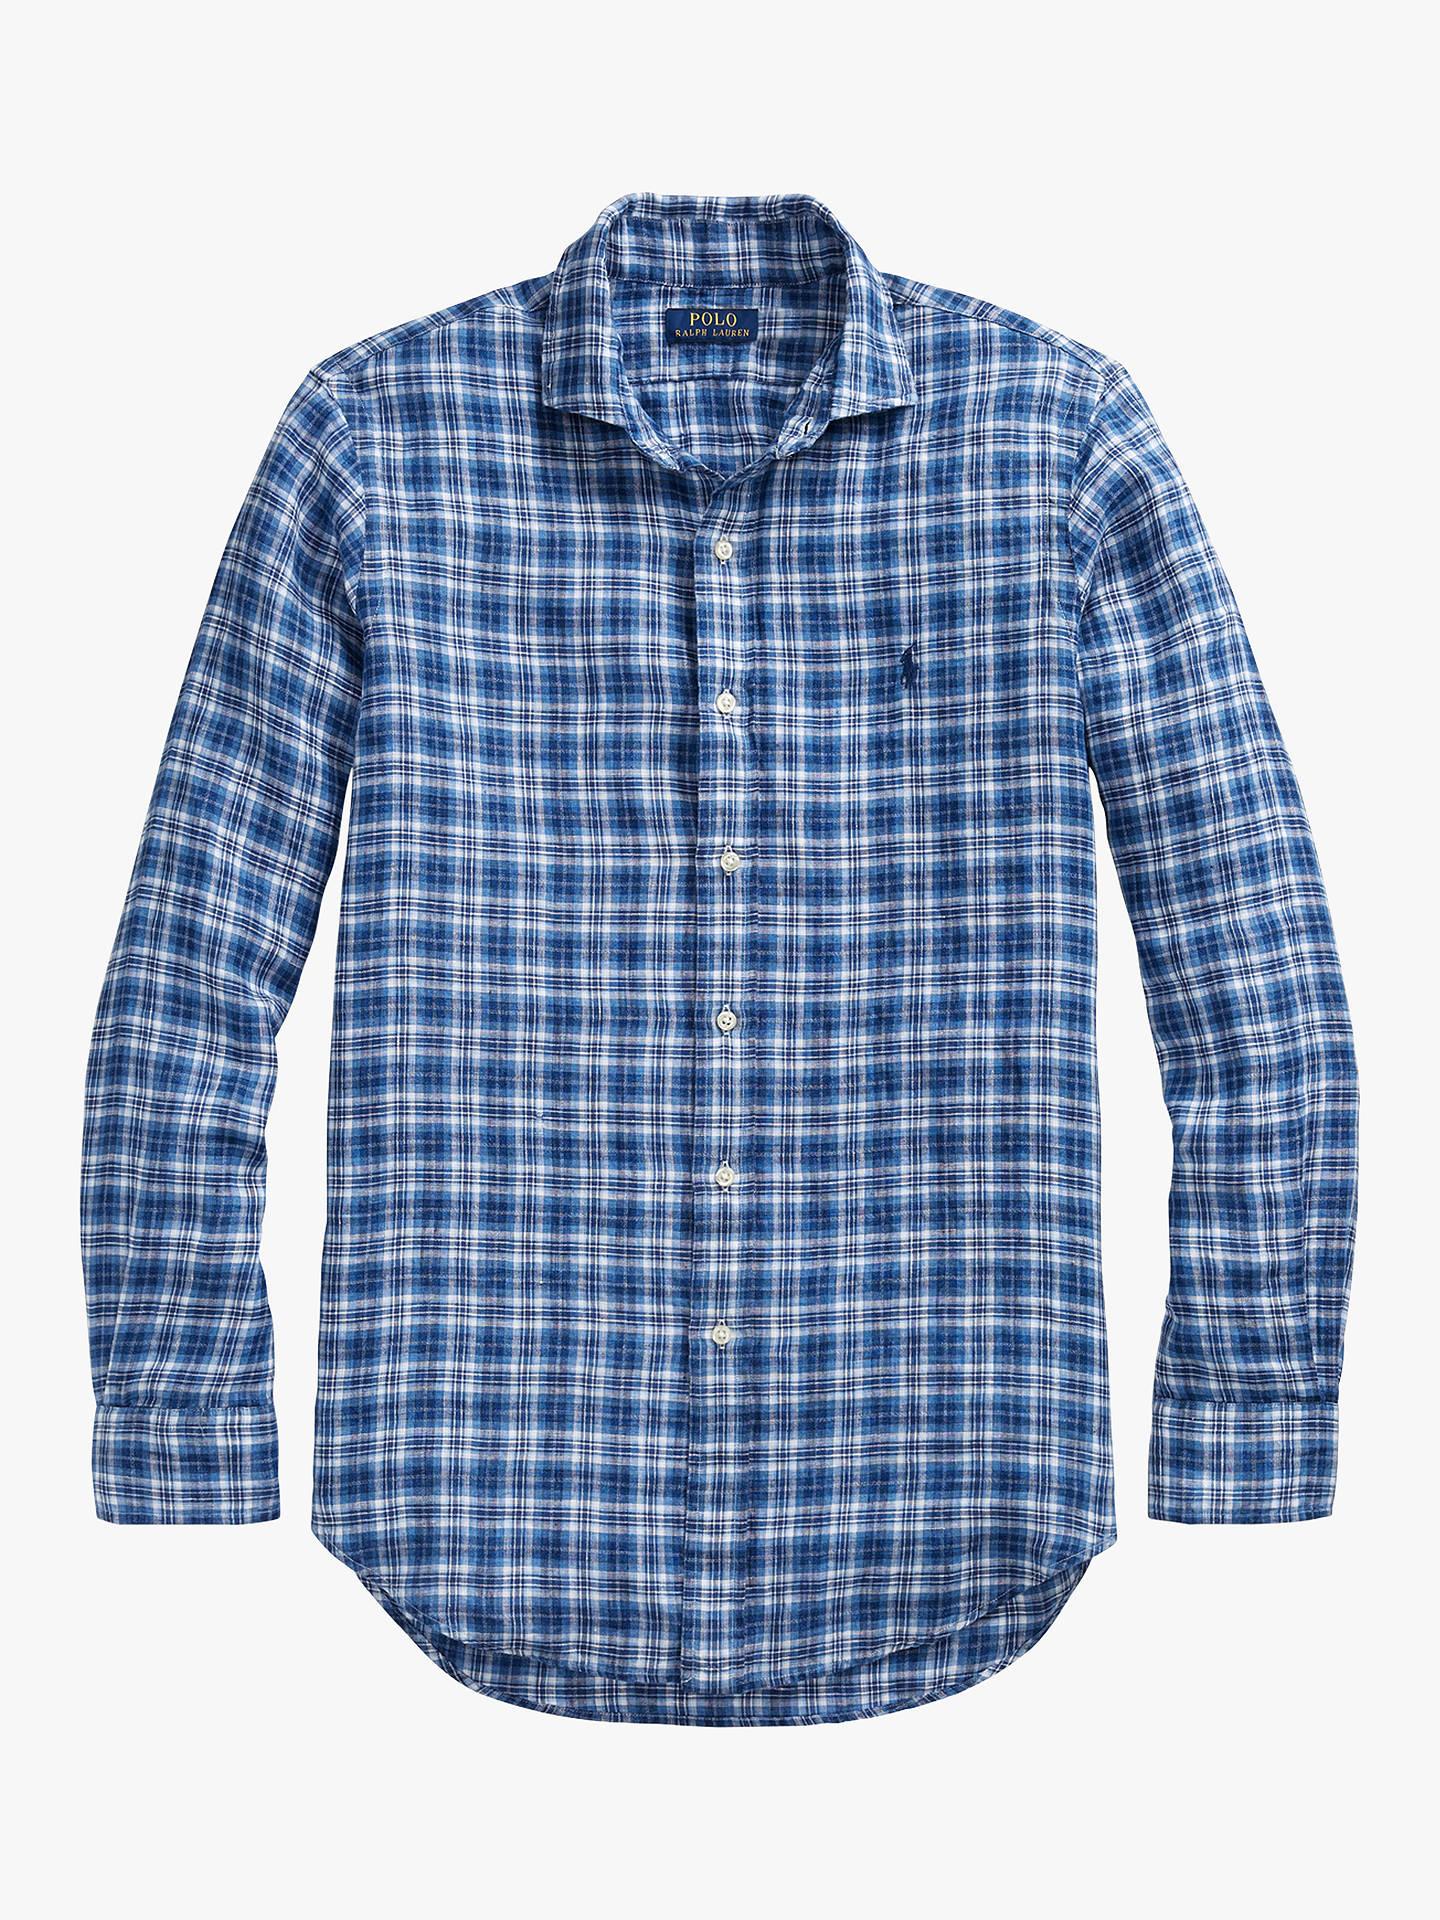 b28a37648 ... Buy Polo Ralph Lauren Linen Plaid Slim Fit Shirt